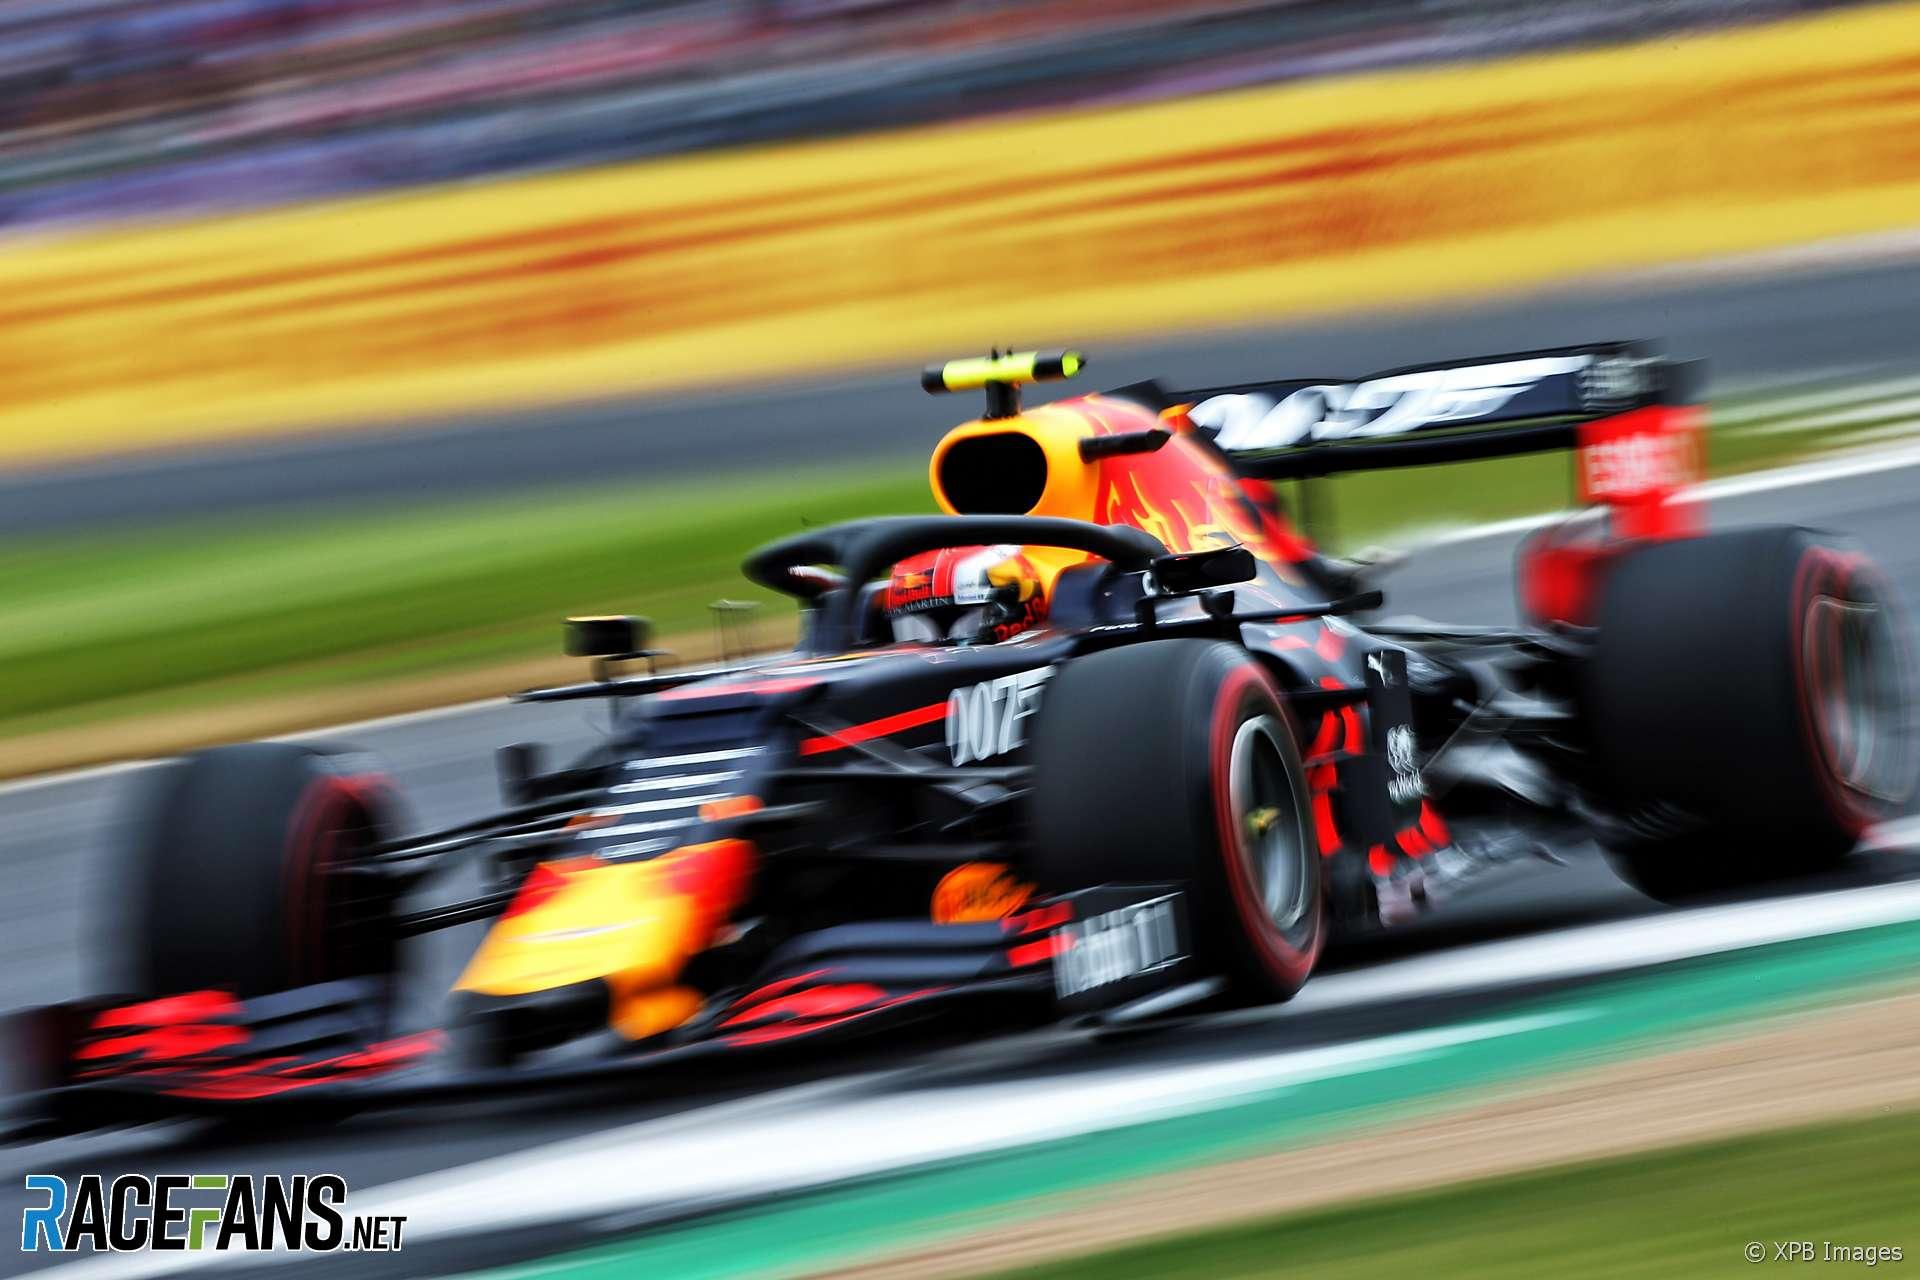 Pierre Gasly, Red Bull, Silverstone, 2019